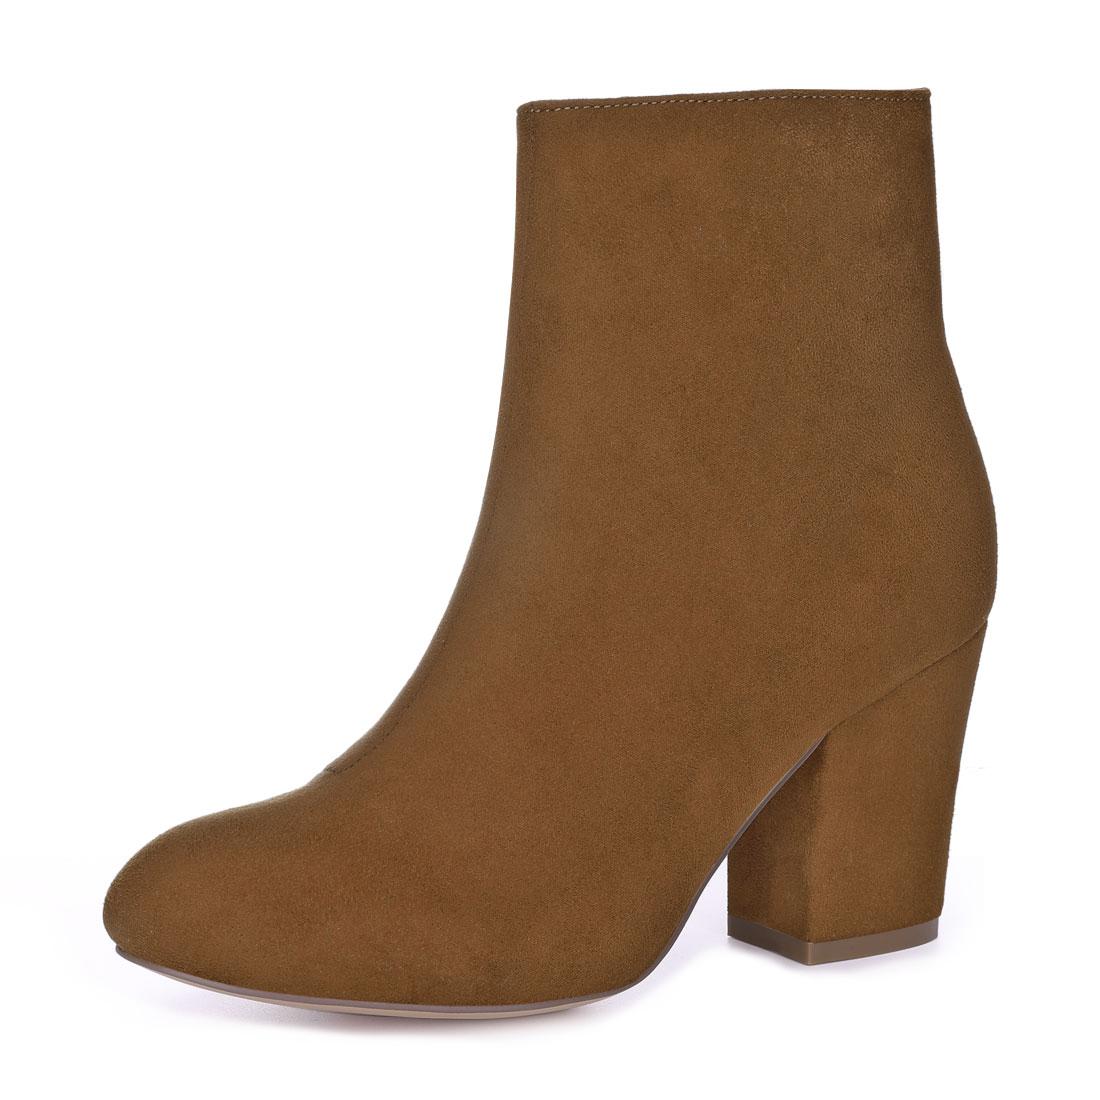 Allegra K Women Round Toe Side Zipper Block Heel Ankle Boots Brown US 10